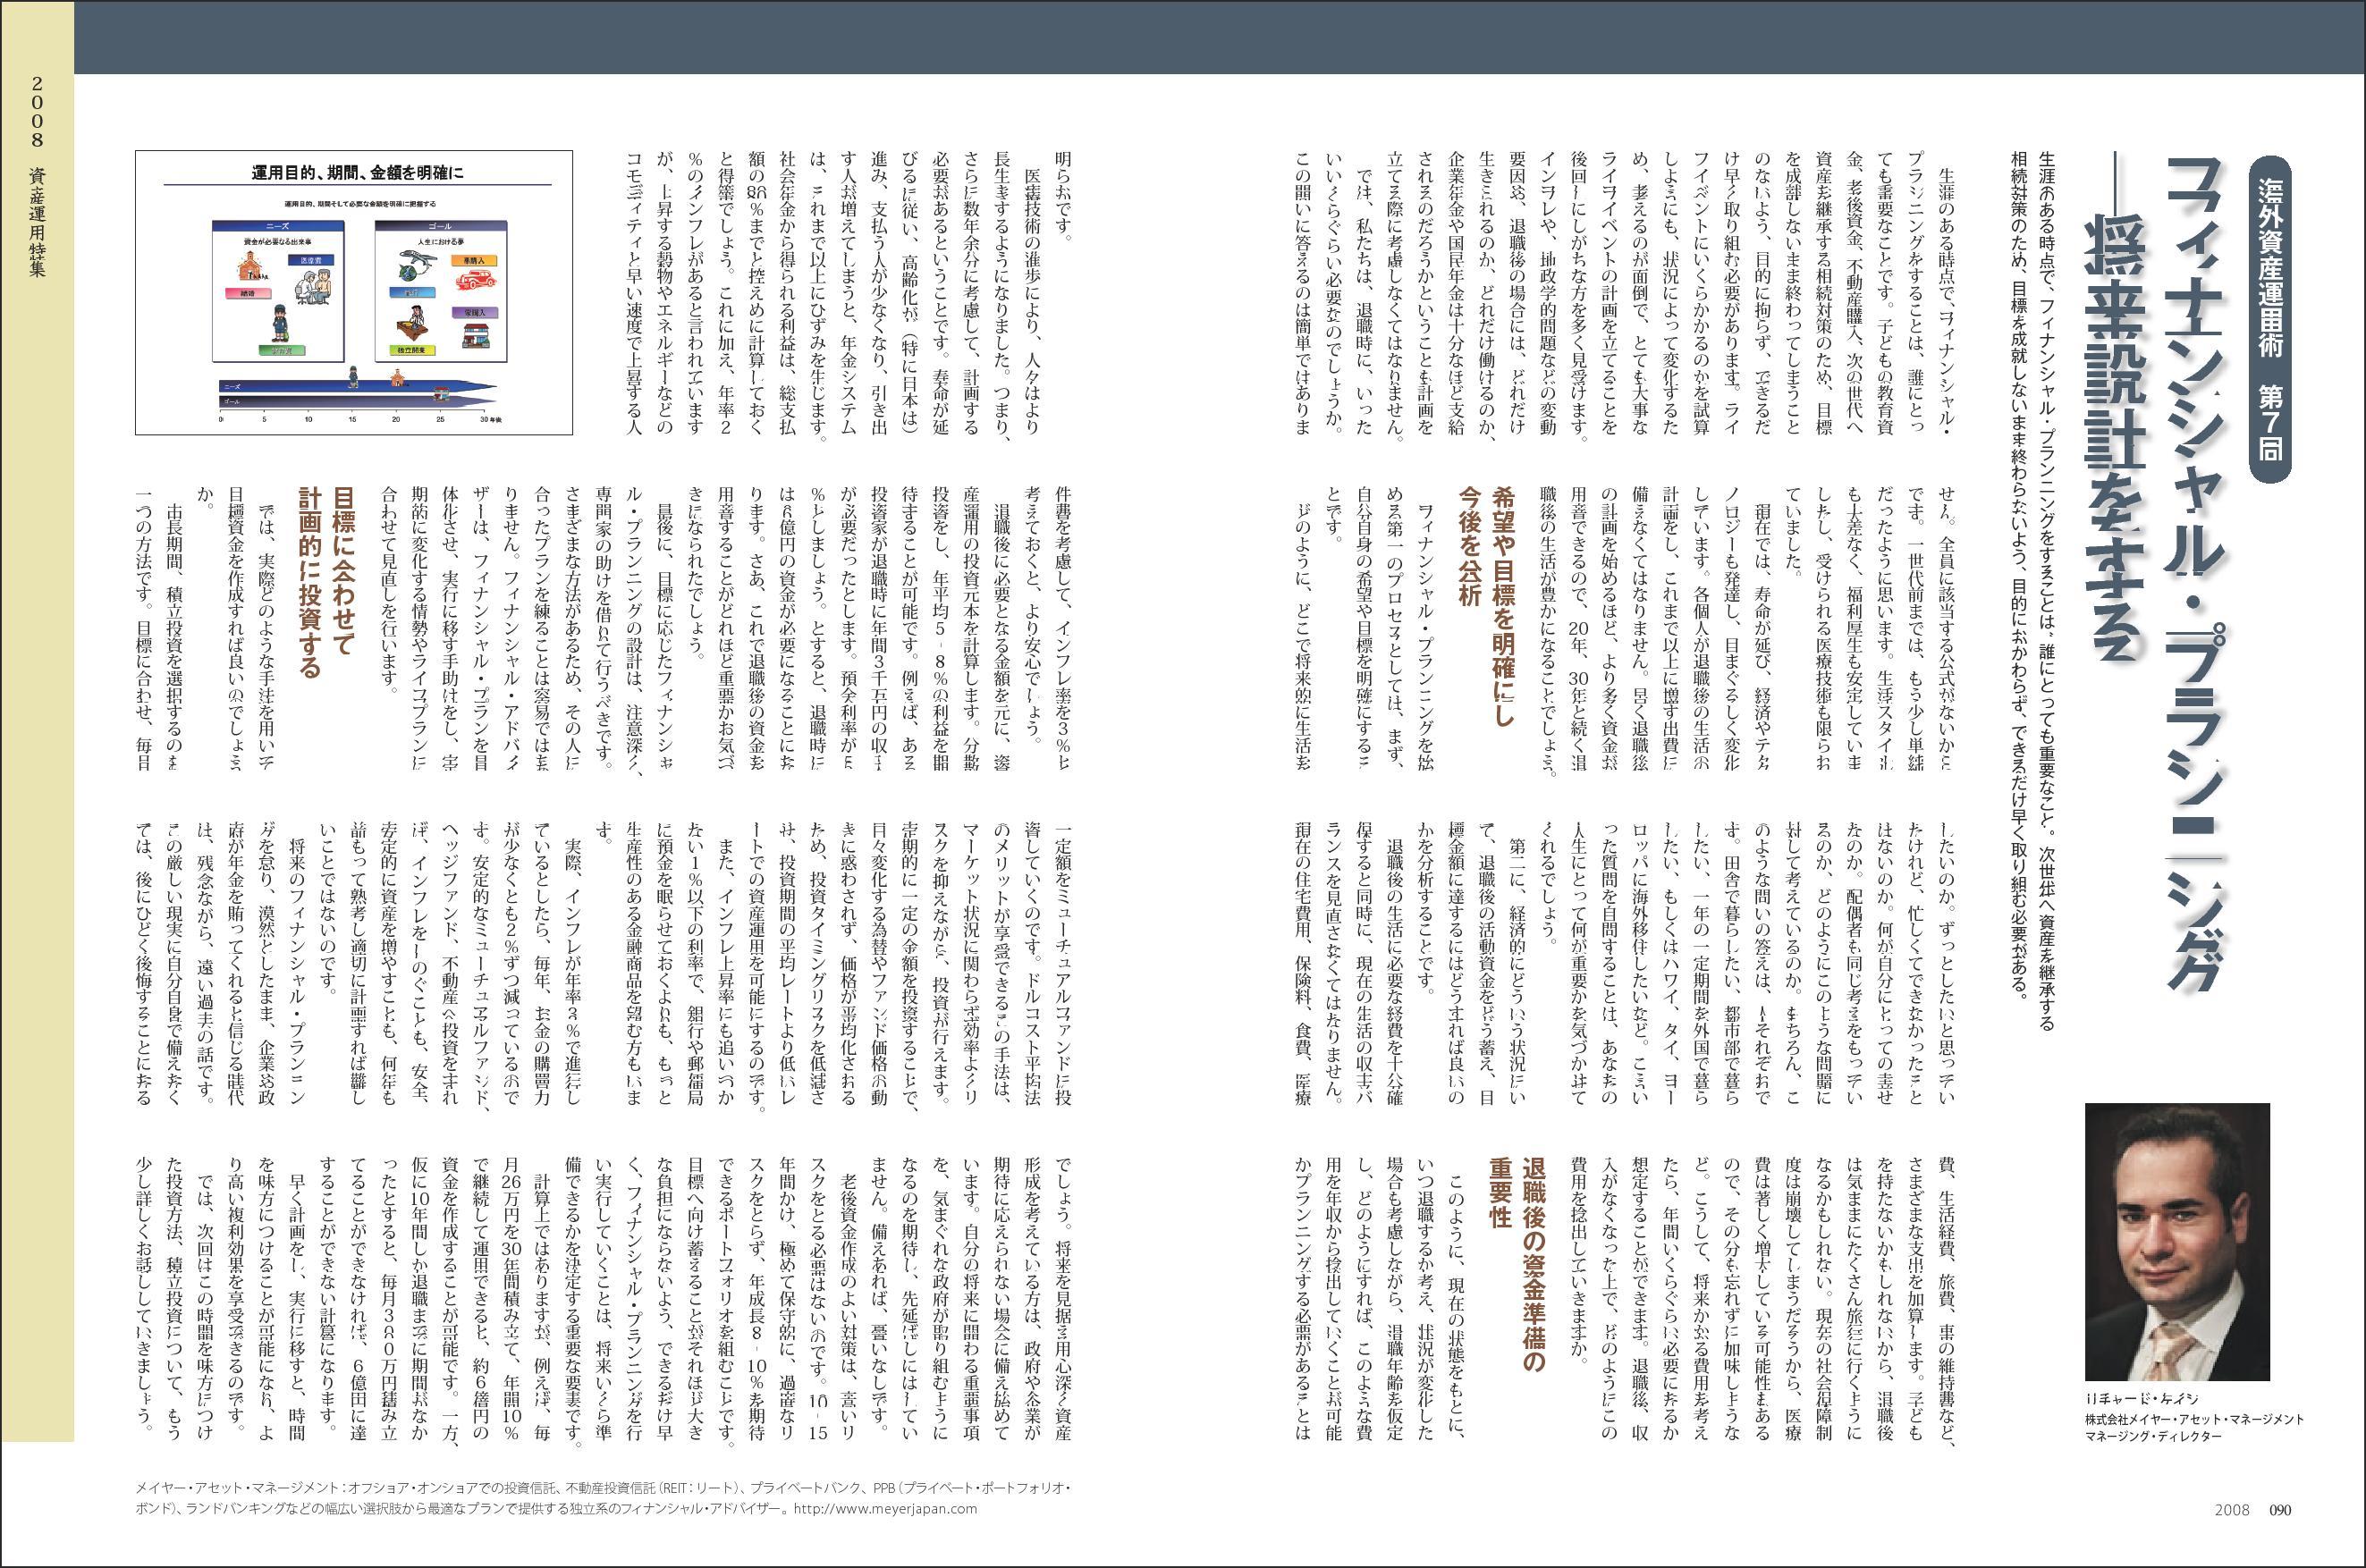 RICHARD CAYNE featured Seven Hills Japan Financial Planning